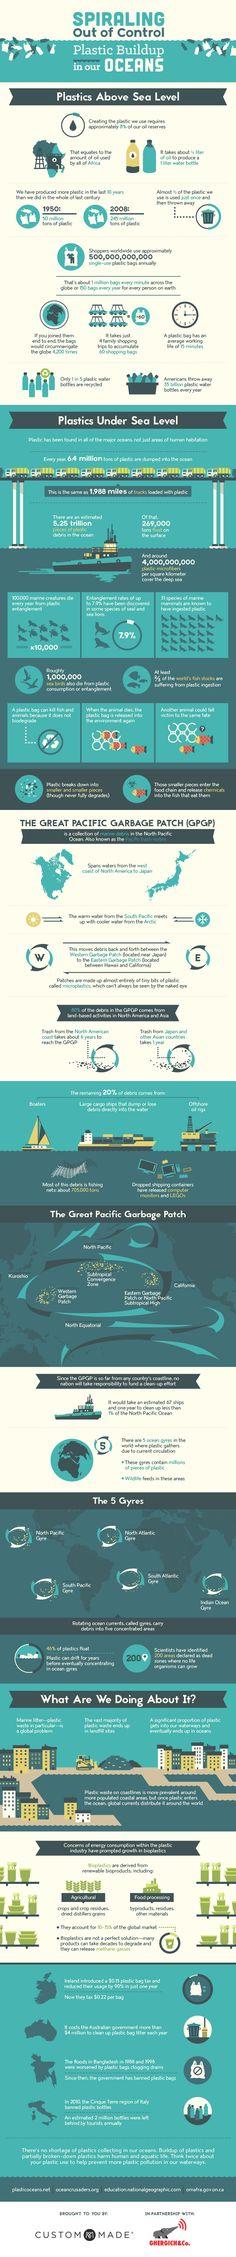 The Pacific's Prolific Plastic Problem